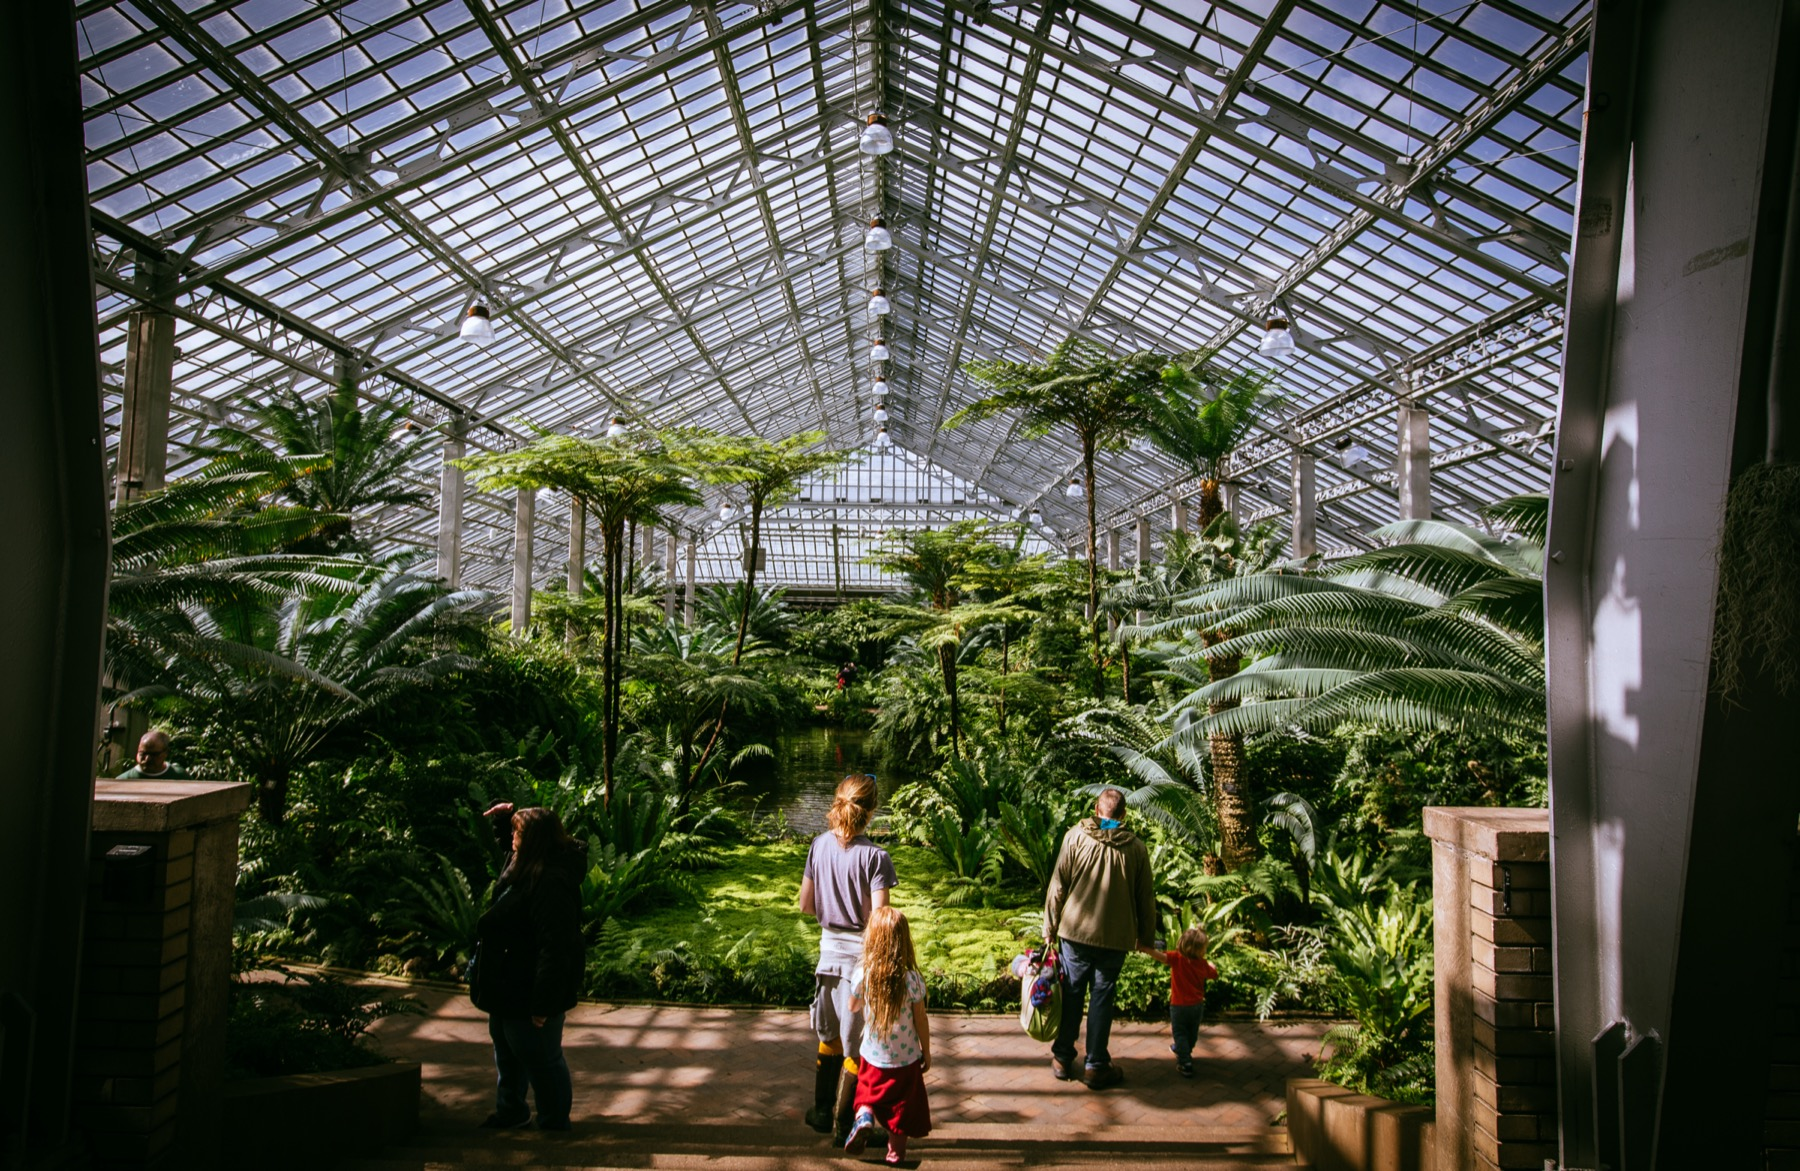 Garfield Park Conservatory fern room